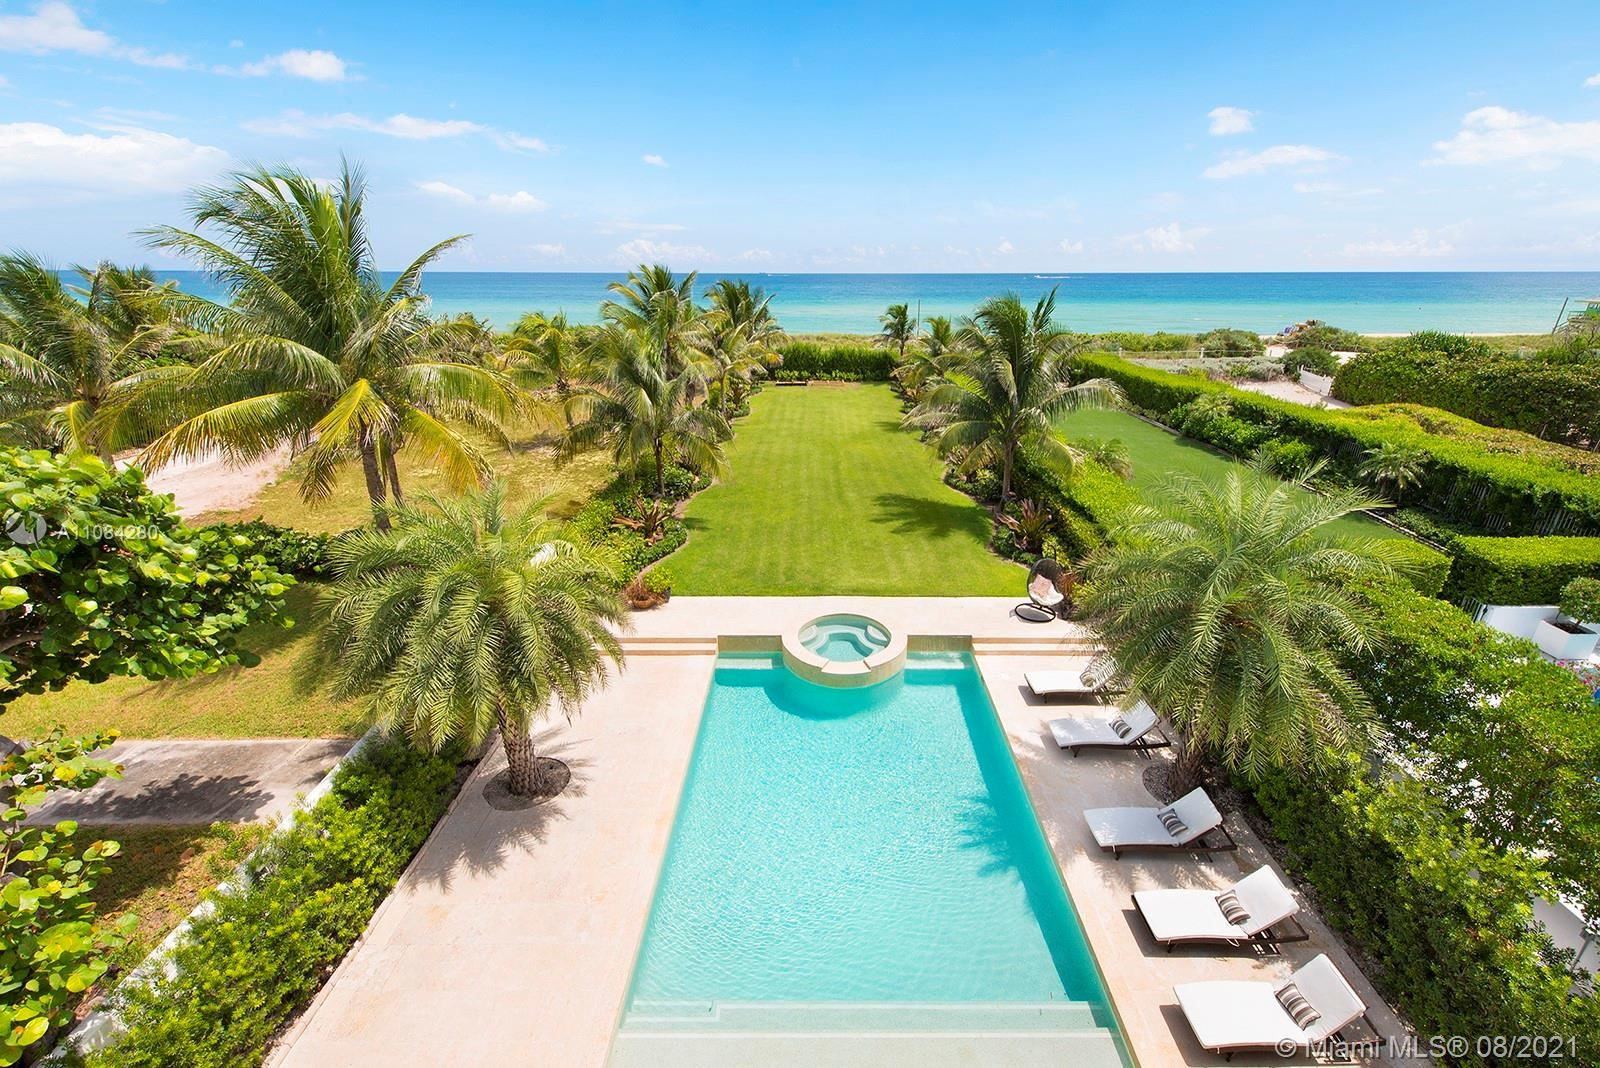 7825 Atlantic Way, Miami Beach, FL 33141 - #: A11084280